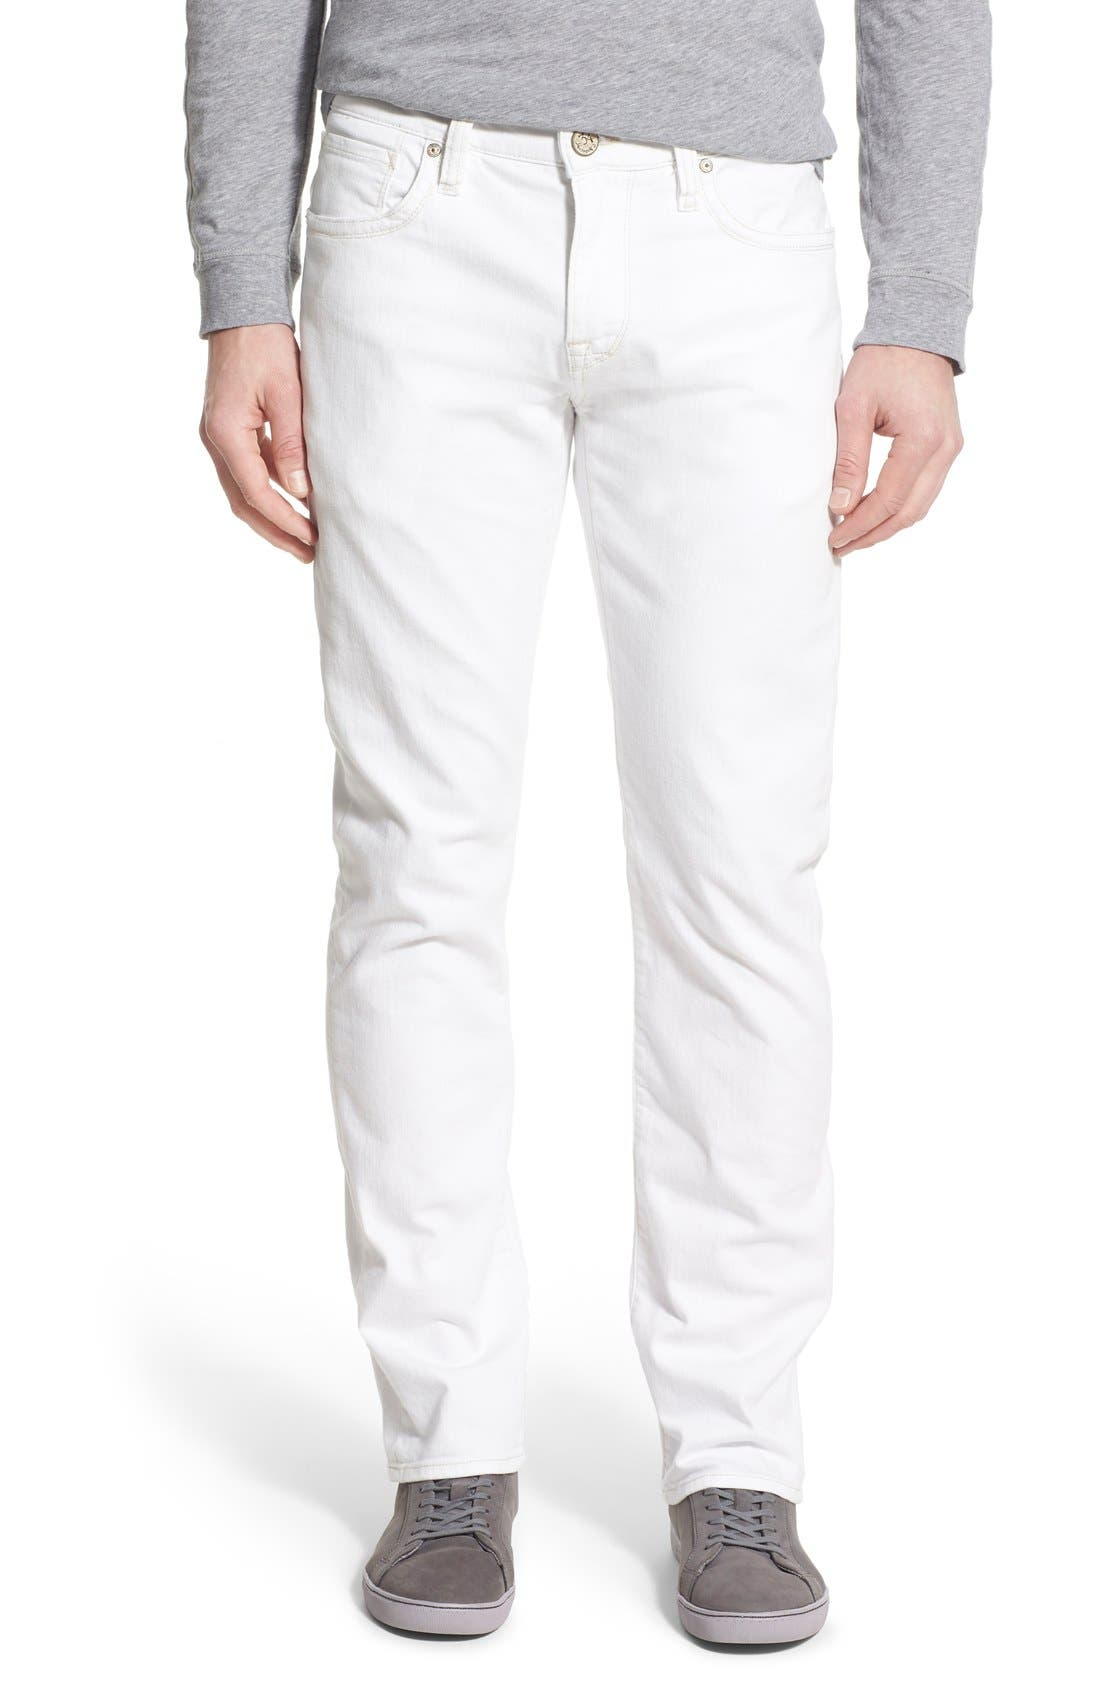 'Courage' Straight Leg Jeans,                             Main thumbnail 1, color,                             WHITE DENIM